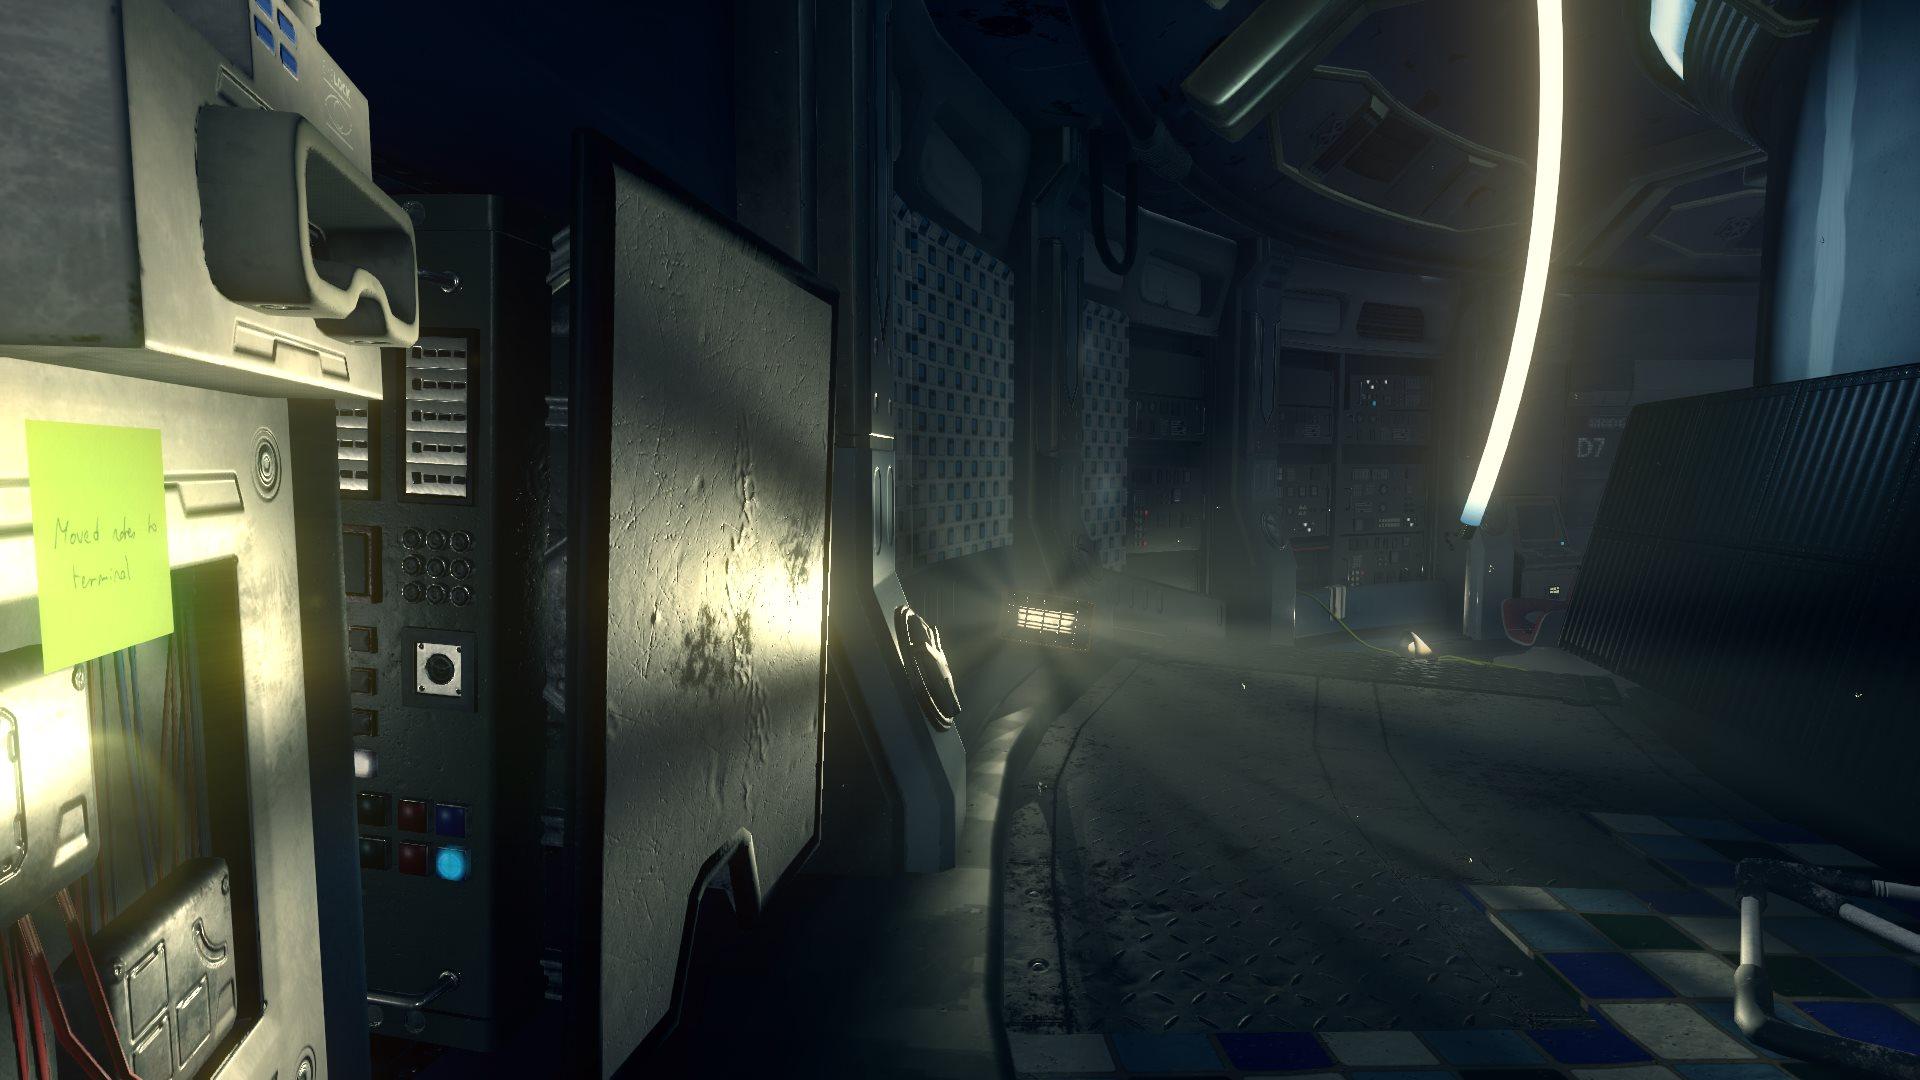 event0-review-screenshot-1